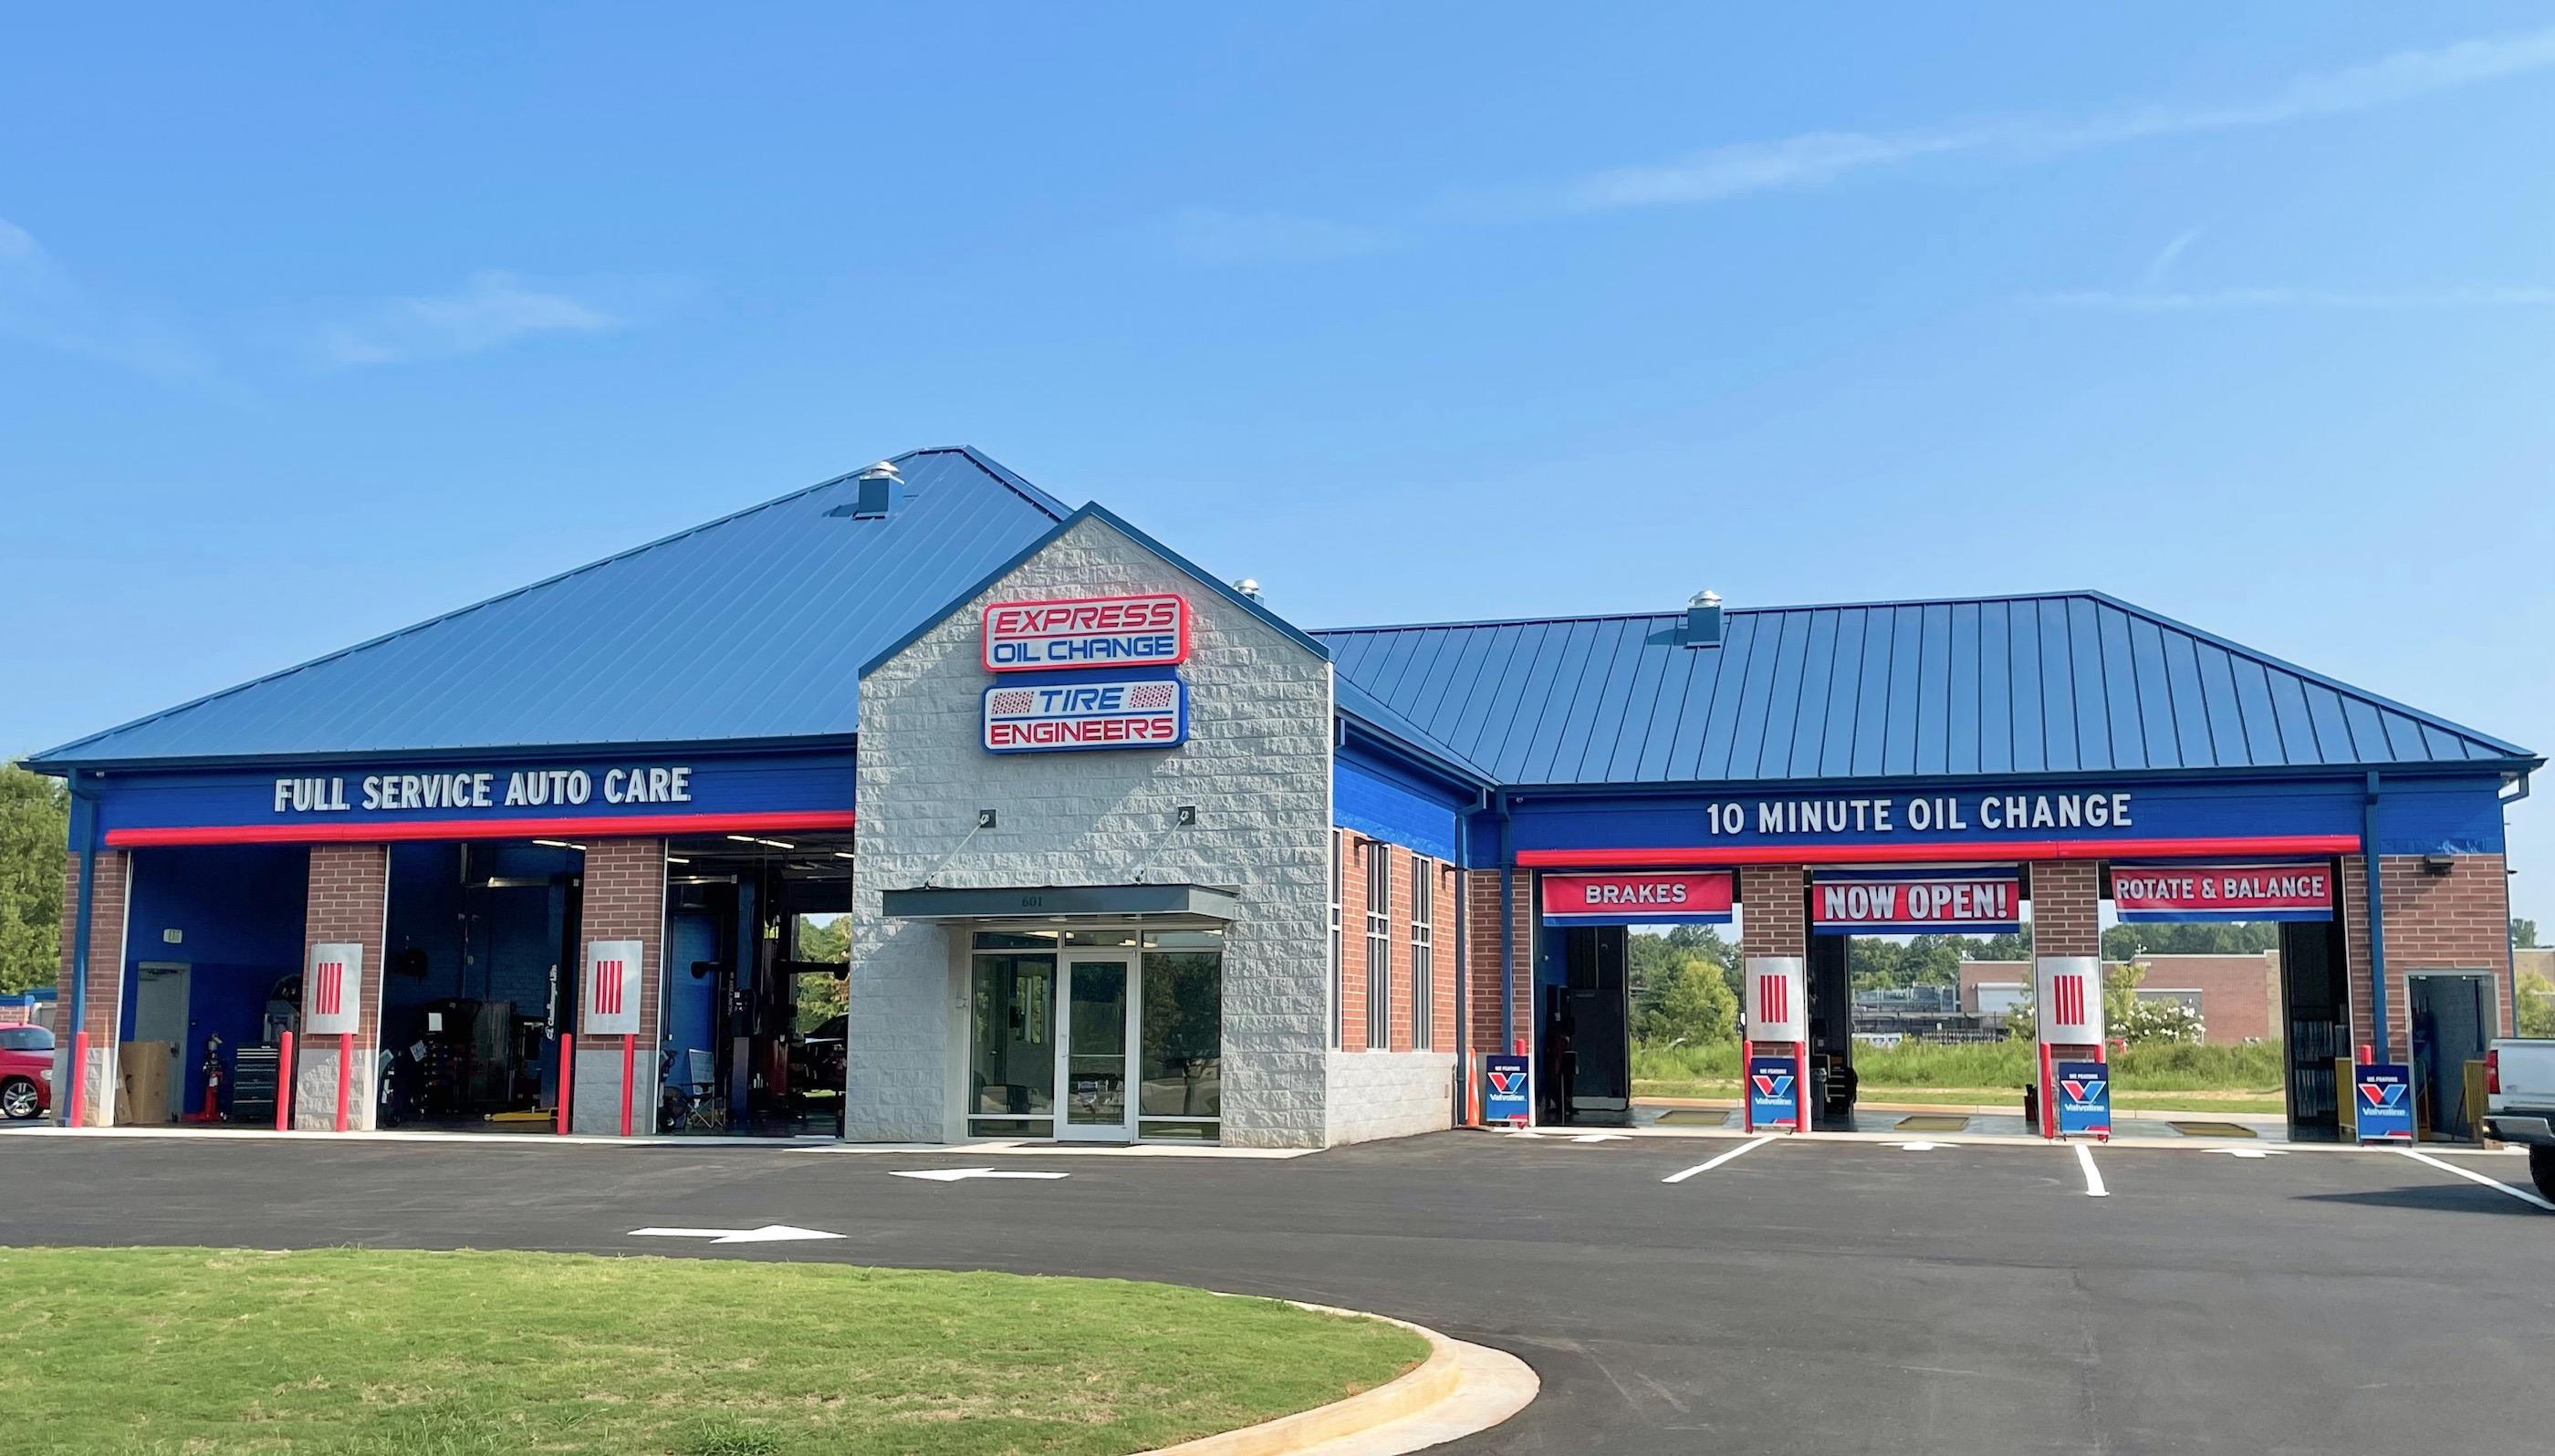 Express Oil Change & Tire Engineers at Locust Grove, GA - Locust Grove store